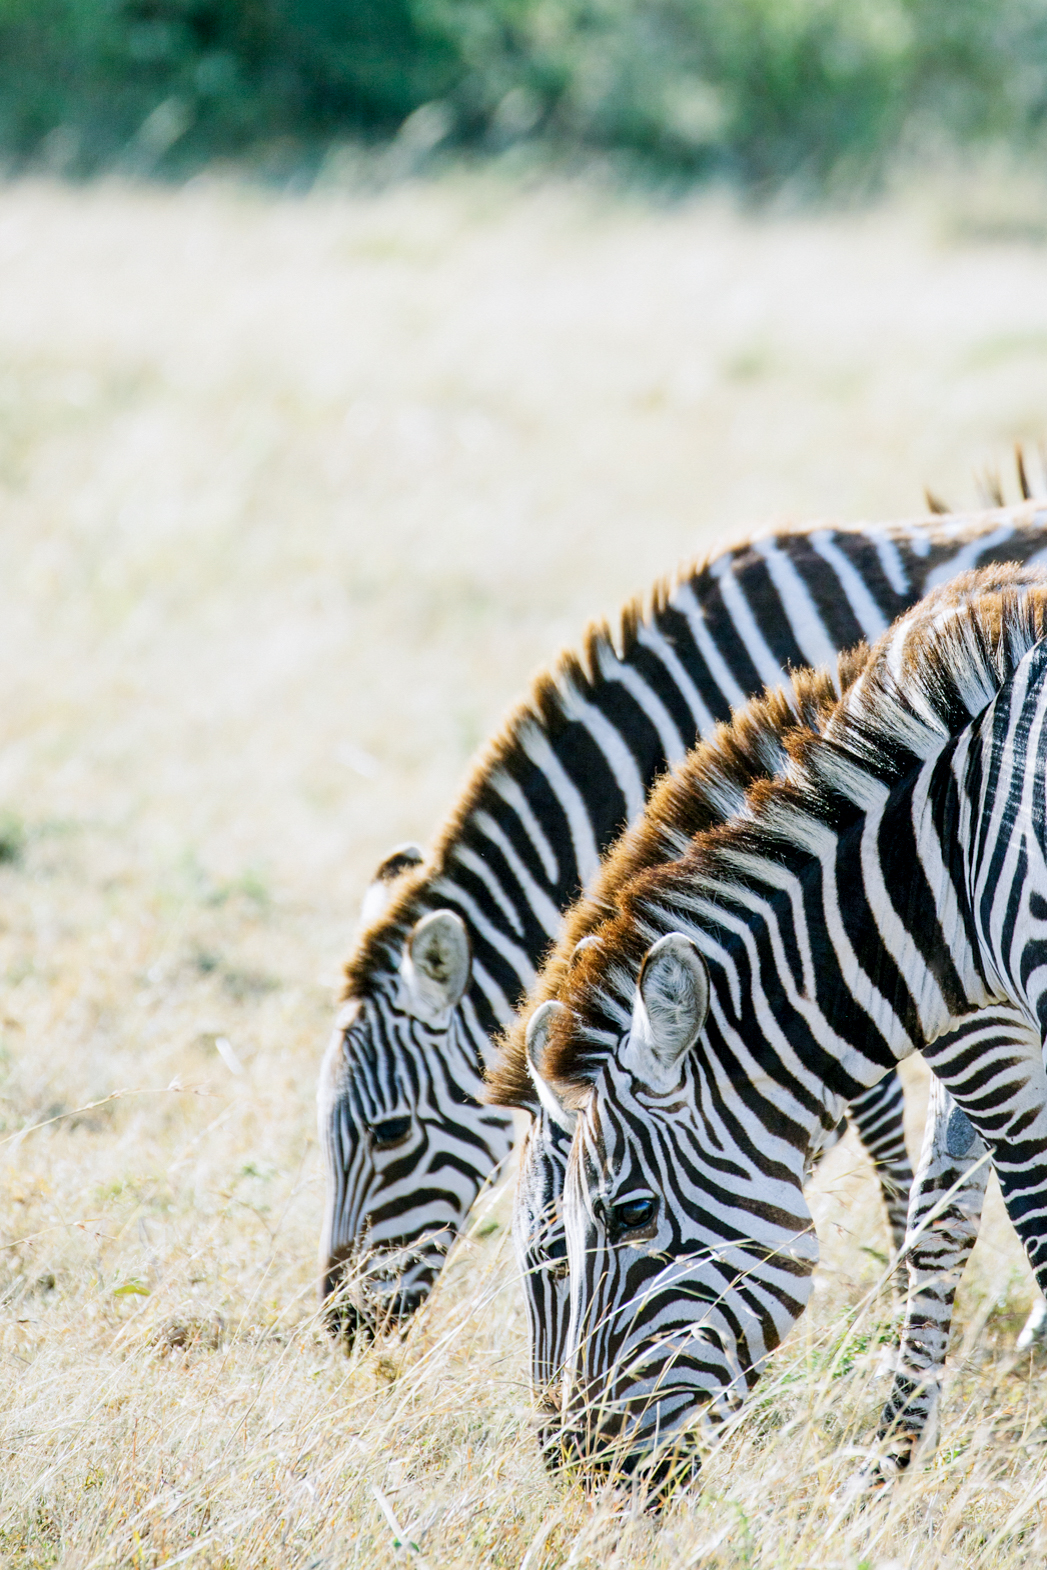 KenyaFeb2019_Safari-118.jpg